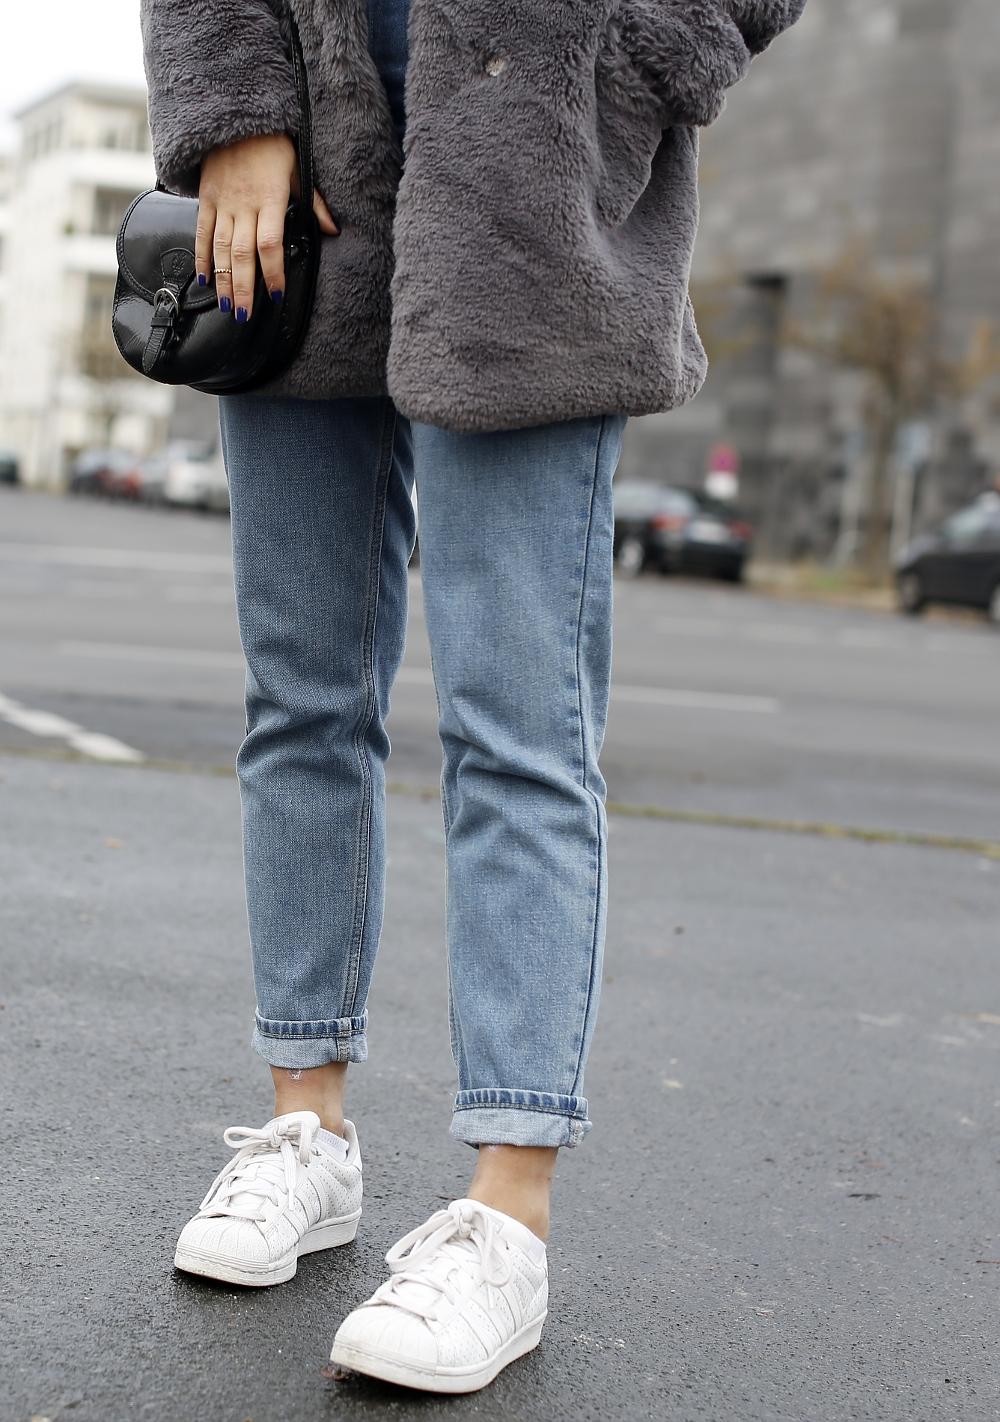 grey plush coat  bomboogie grey fake fur coat jacket teddy fur furry jacket fluffy coat mom jeans MOTO Topshop mom jeans highwaist adidas superstars women outfit girl streetstyle samieze fashionblog